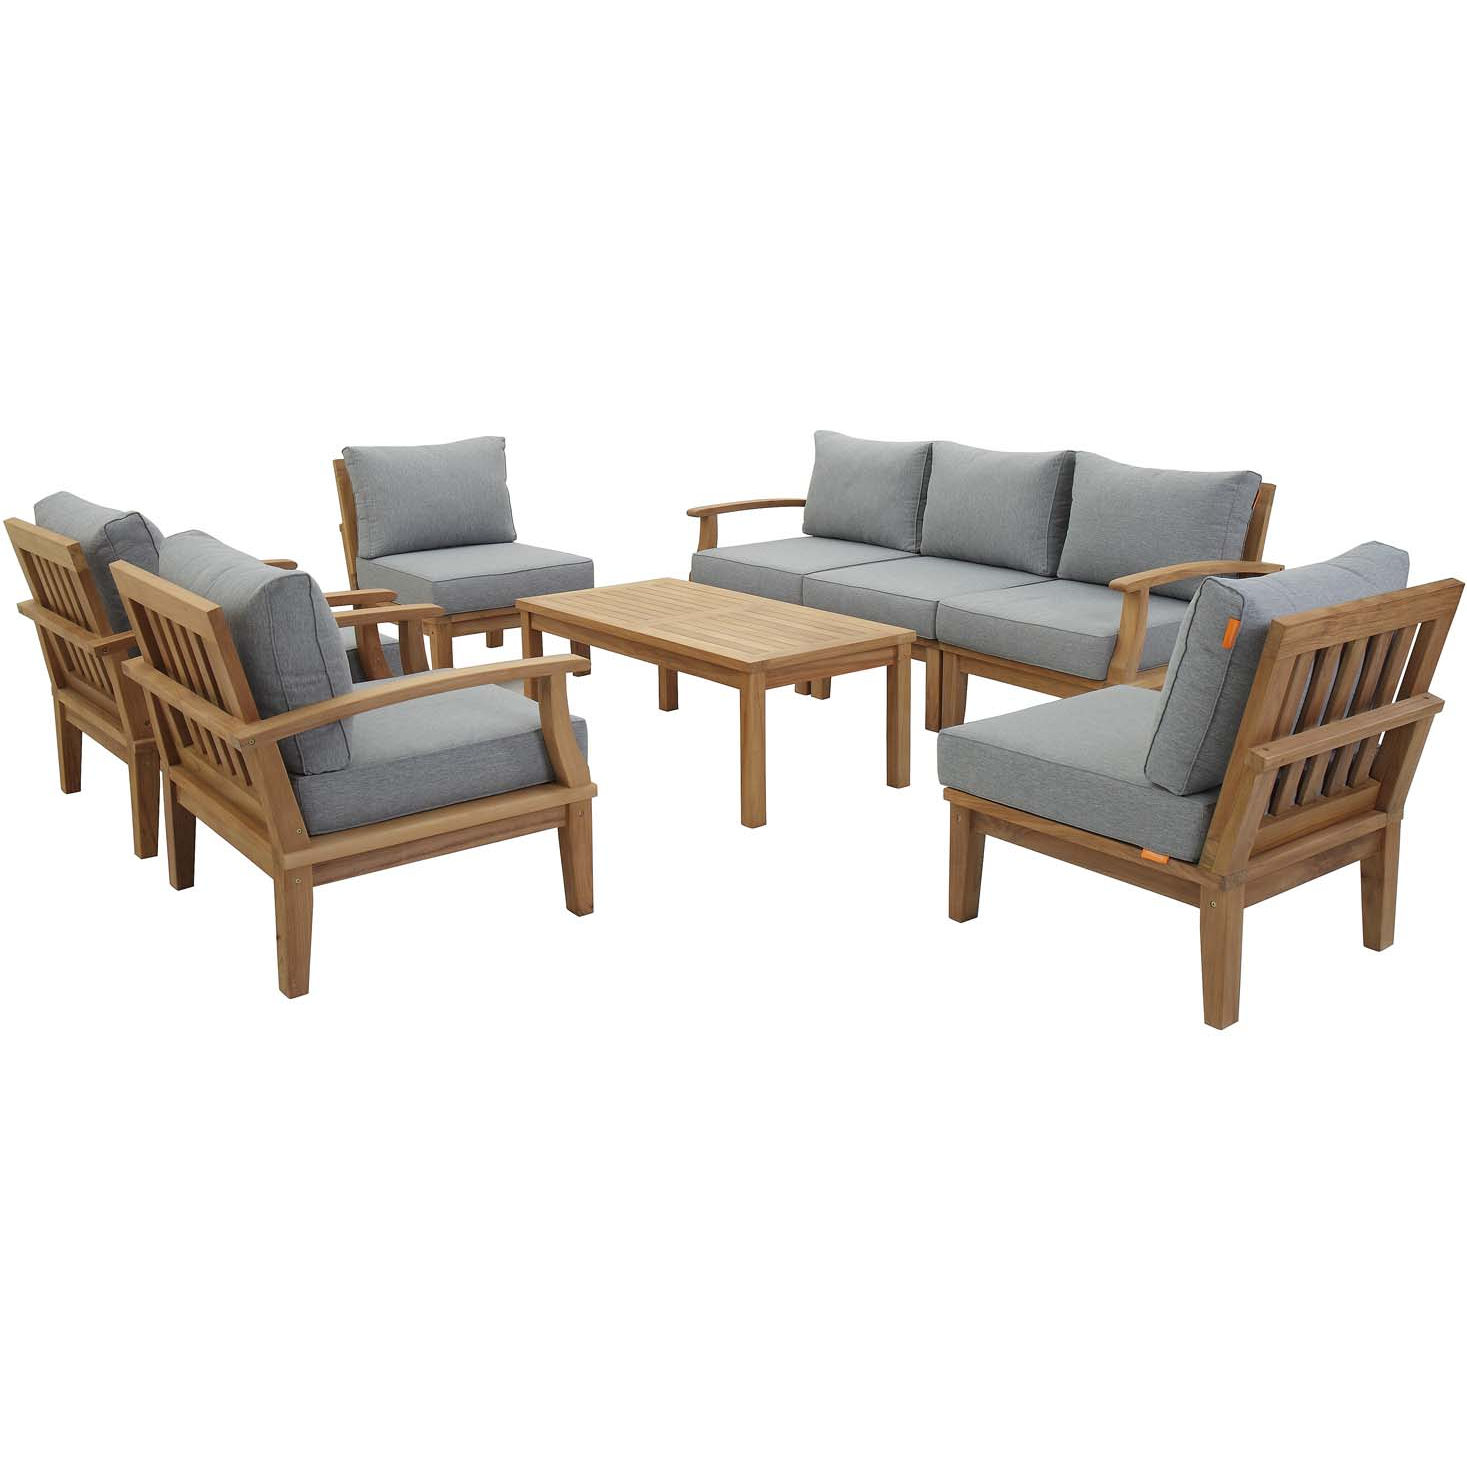 Miraculous Marina 8 Piece Outdoor Modular Sectional Sofa Set In Teak Gray Fabric By Modway Customarchery Wood Chair Design Ideas Customarcherynet